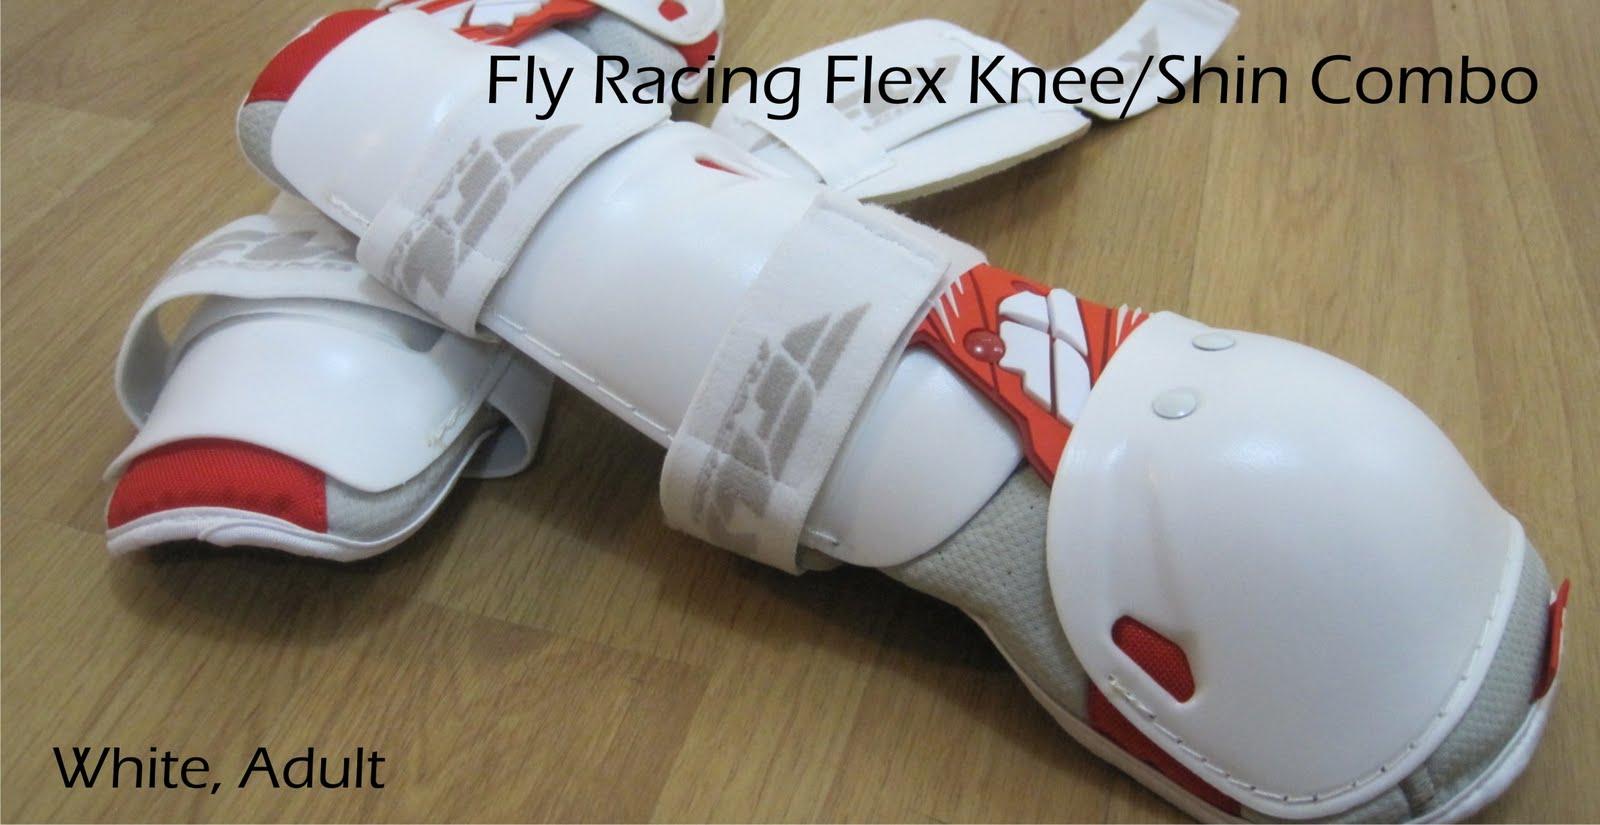 http://3.bp.blogspot.com/_2lEGMvRTpVg/THxWQ6sRfTI/AAAAAAAABMs/mUMG2SDqBa4/s1600/fly+racing+flex.jpg